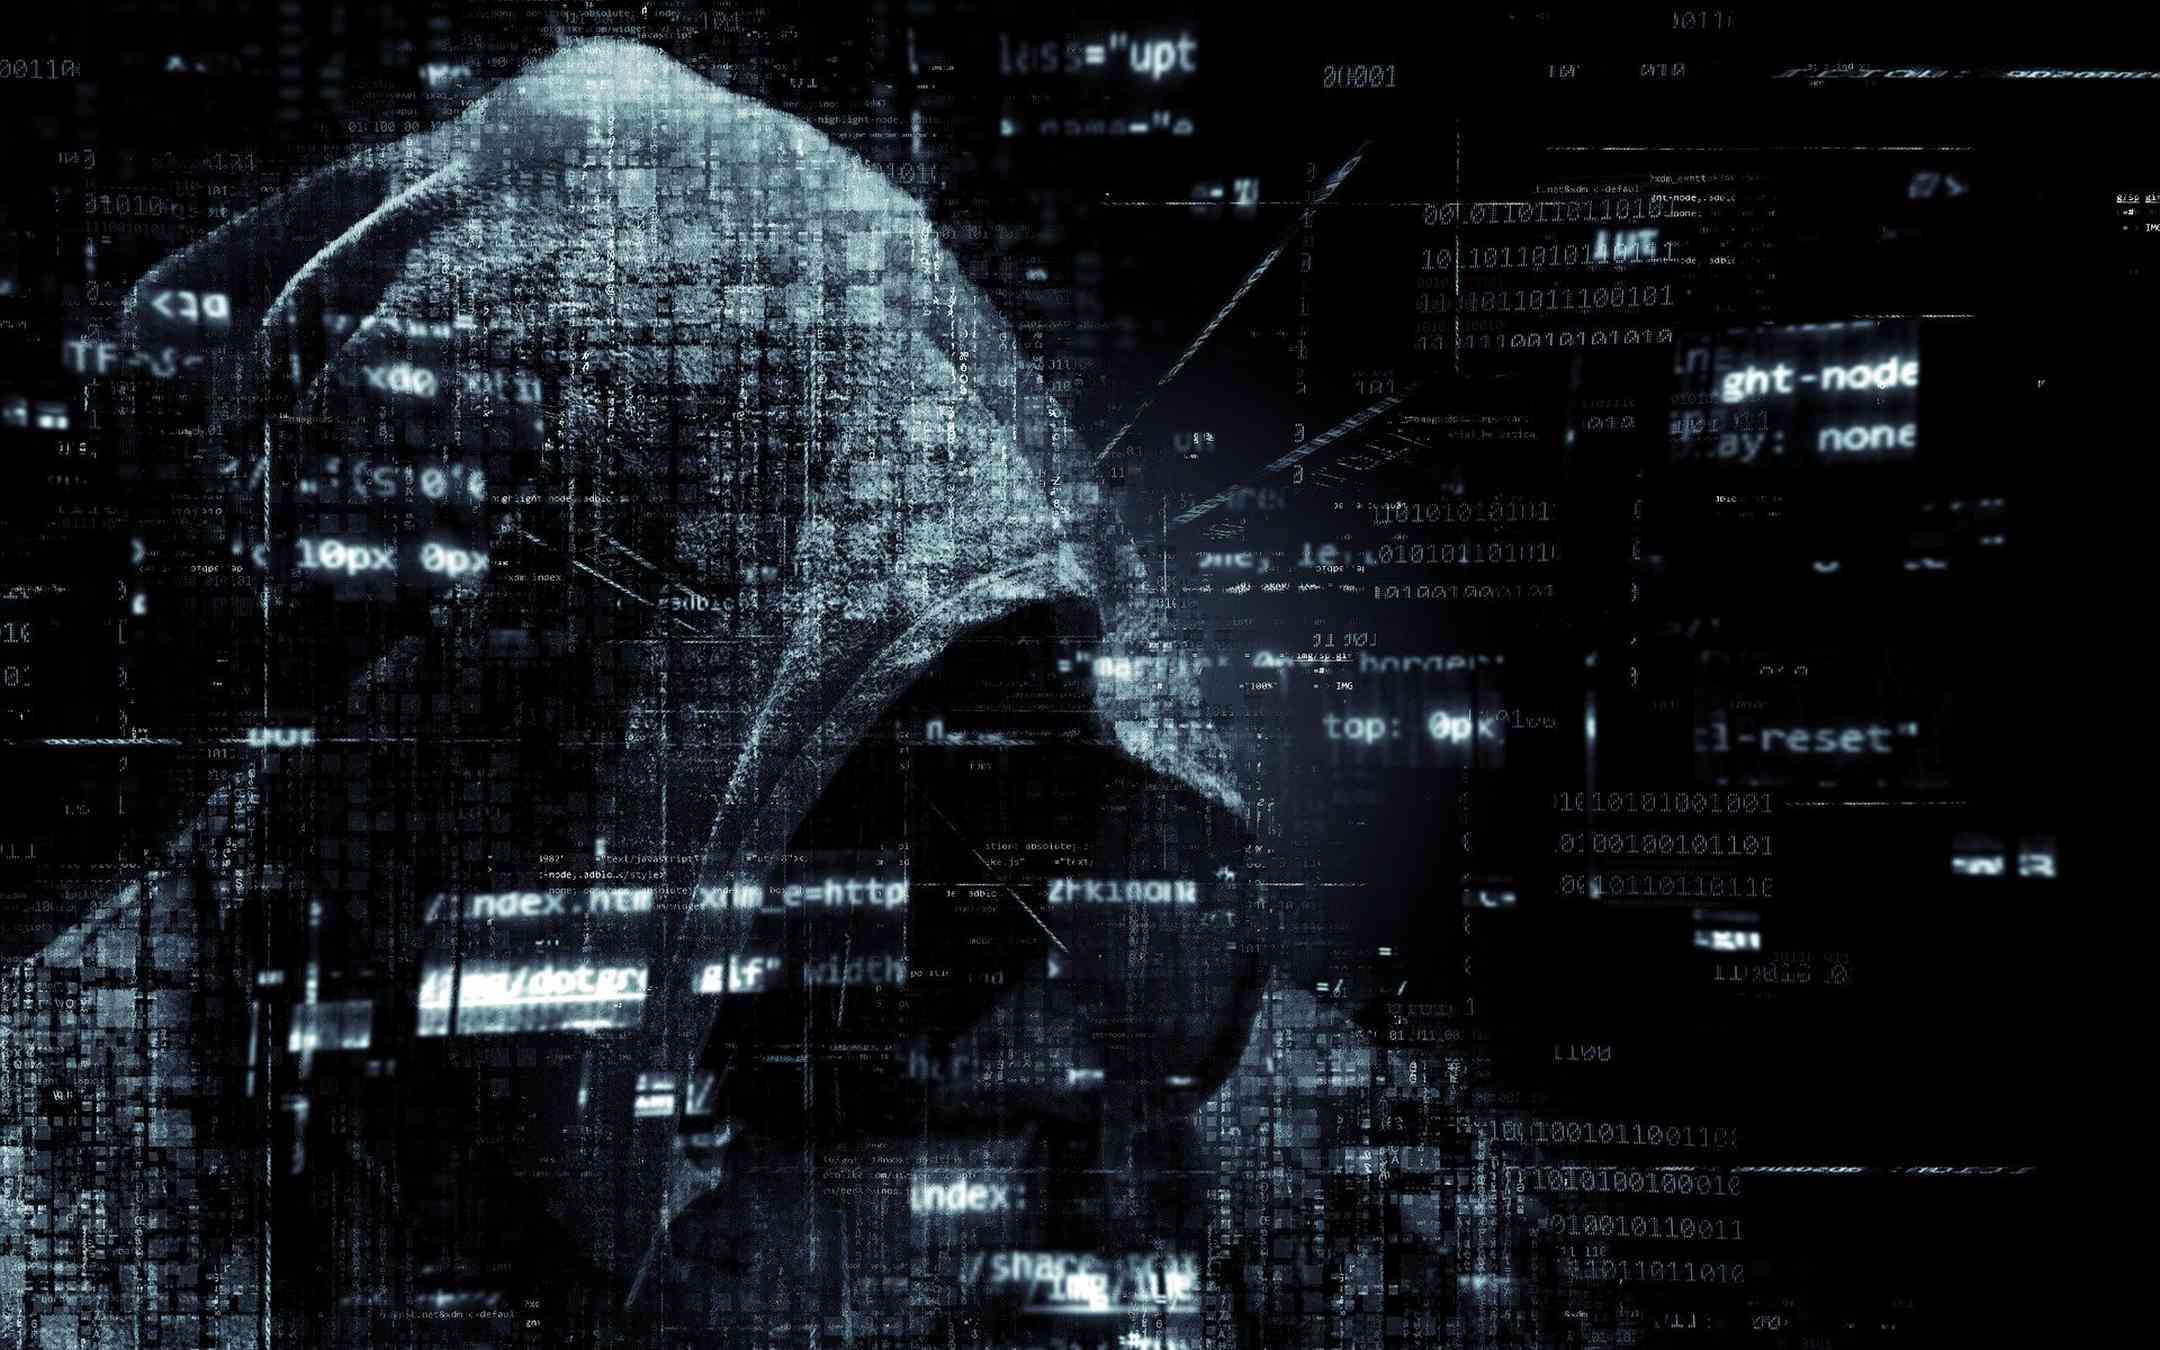 Jian, Chinese version of an NSA exploit